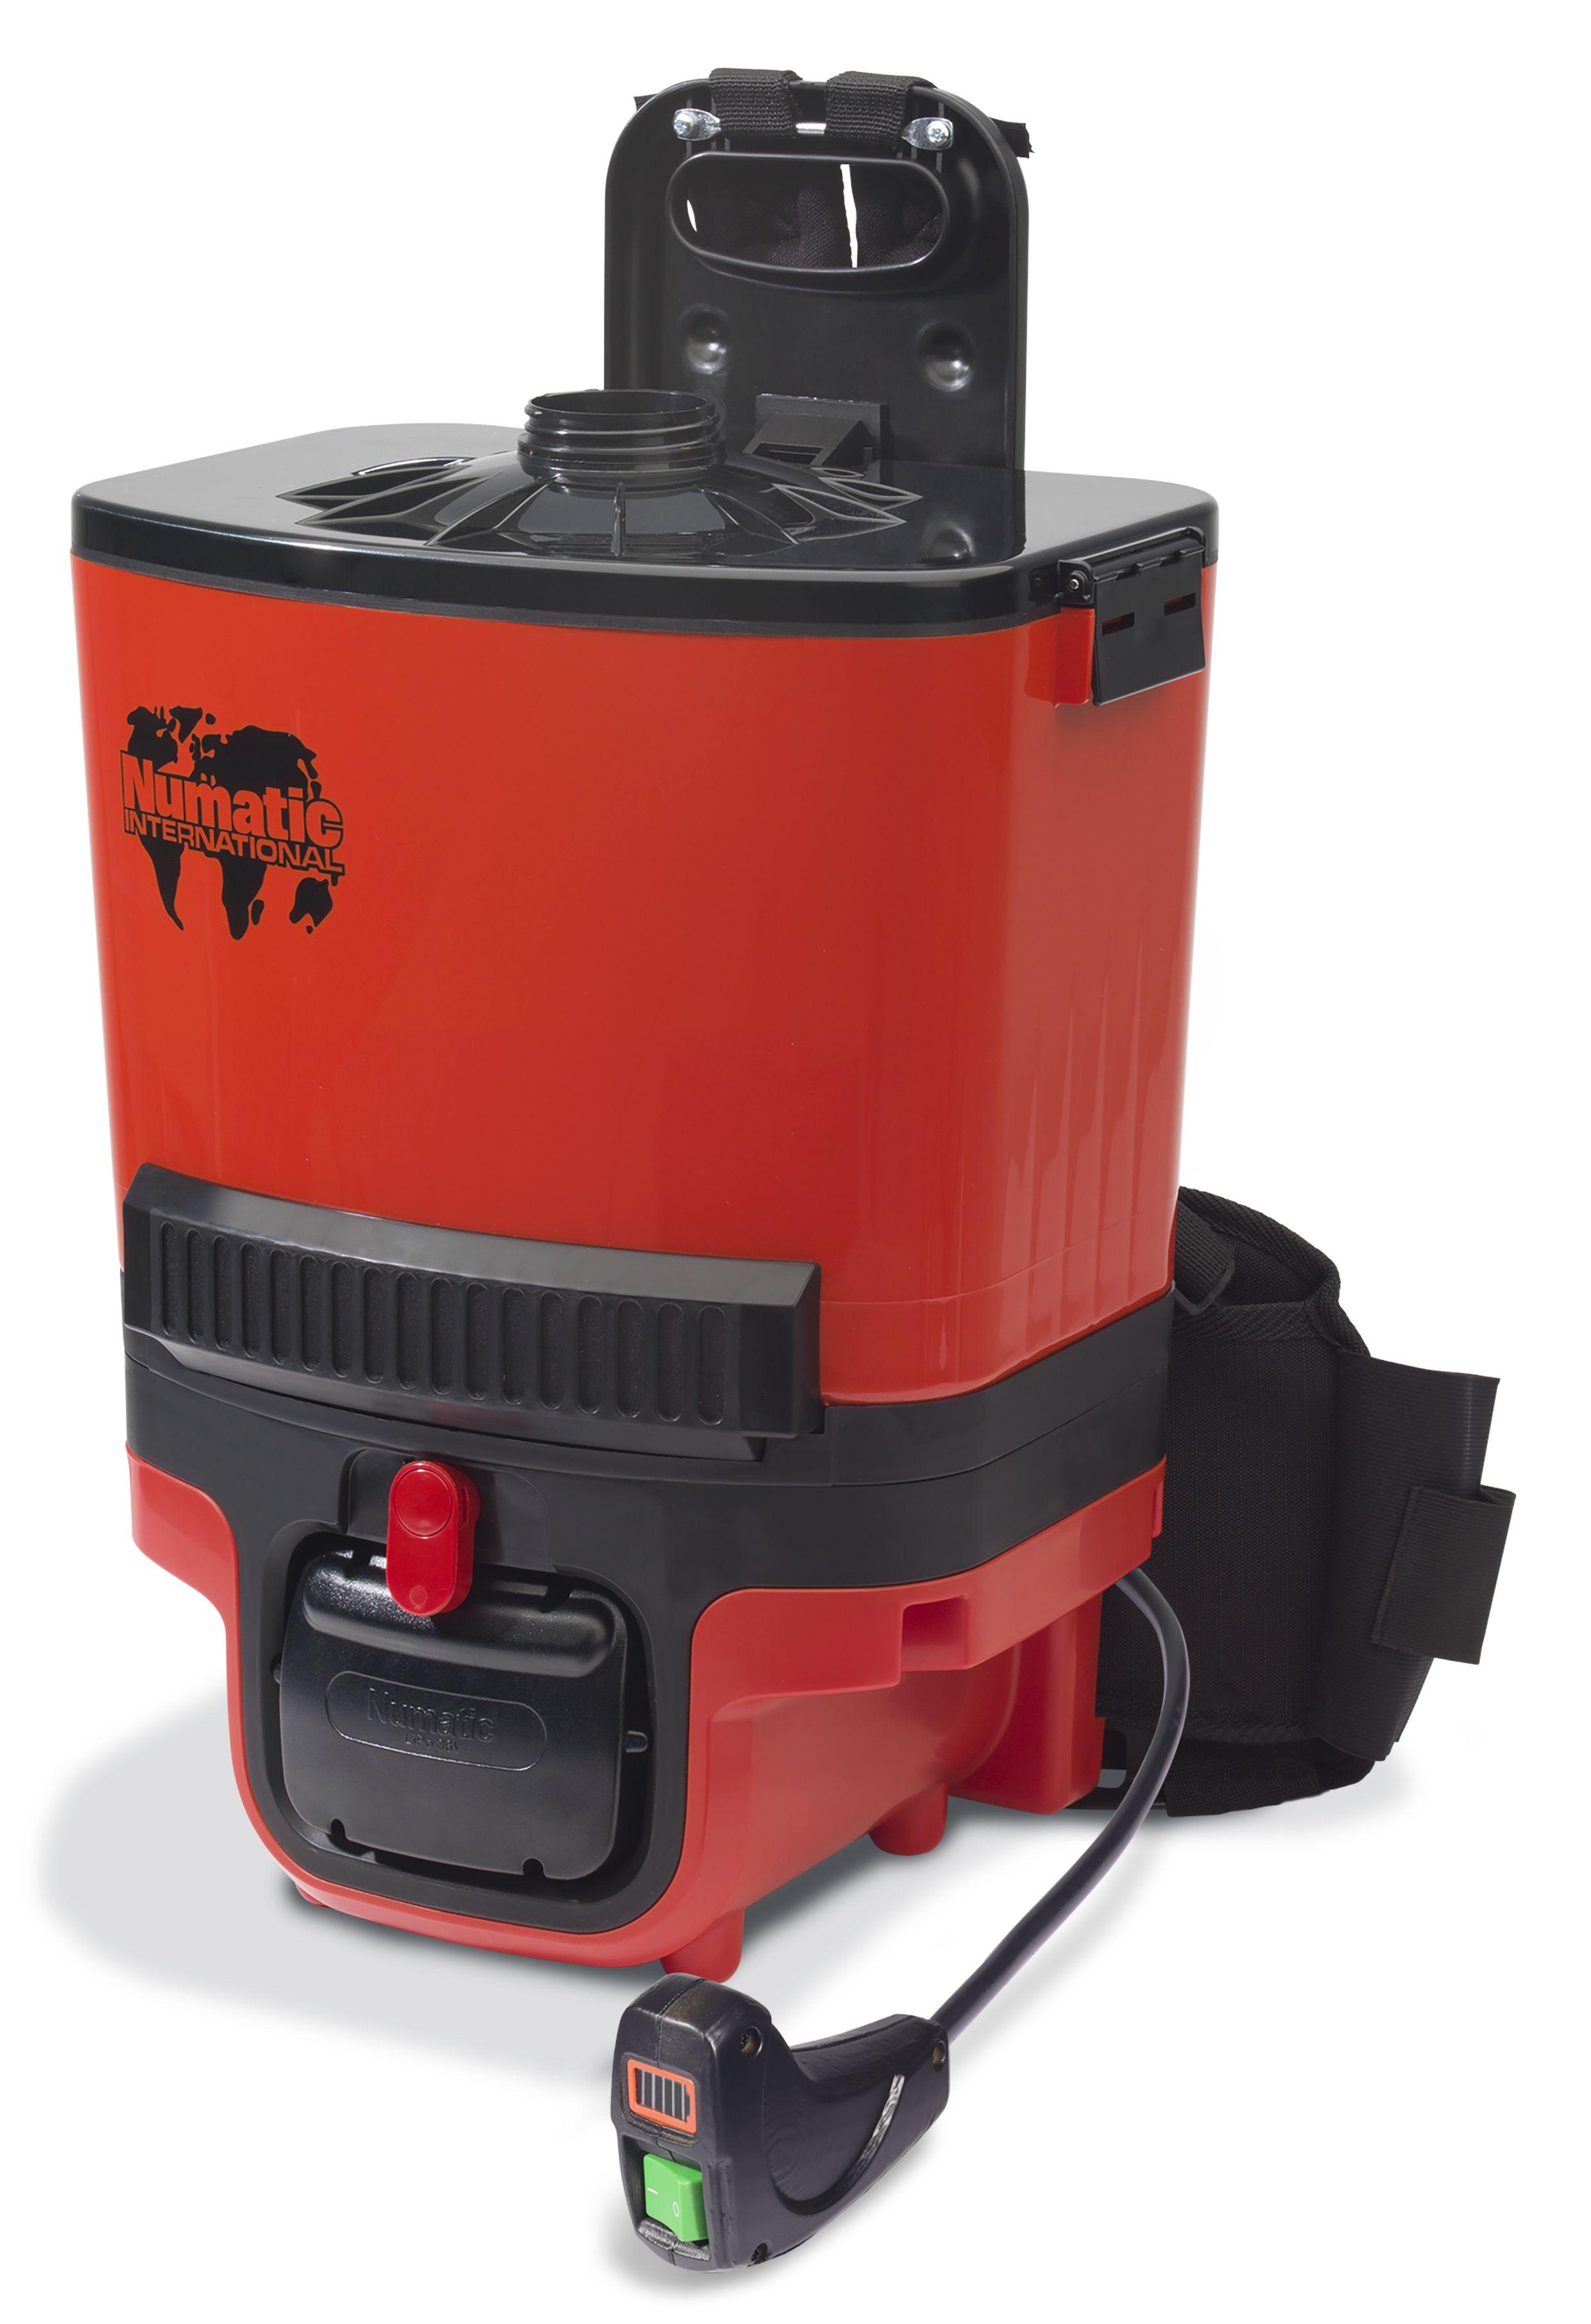 RSB140-2 Rugstofzuiger kit AA30E 2x lithium ion batterij